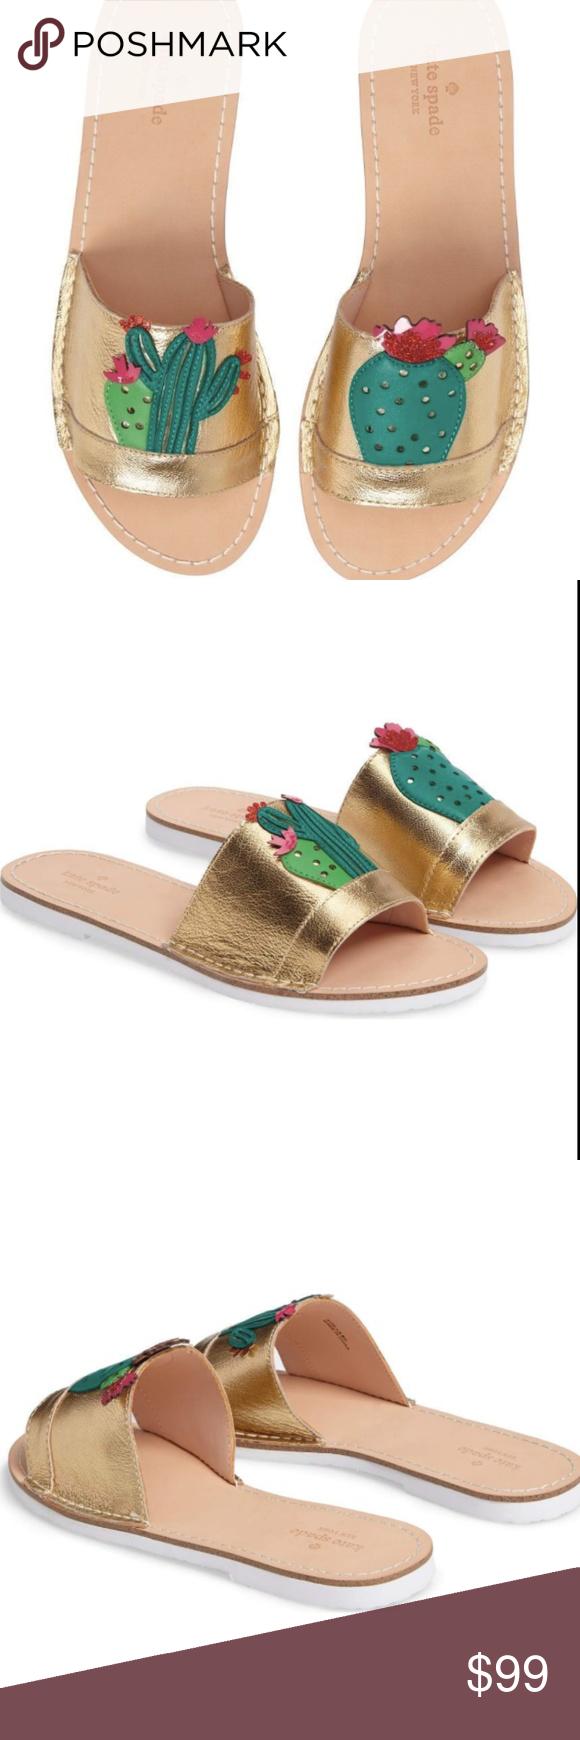 ce59e4f3f347 Kate Spade Gold Iguana Cactus Slides Sandals 7 Bright appliqué cacti at the  strap of kate